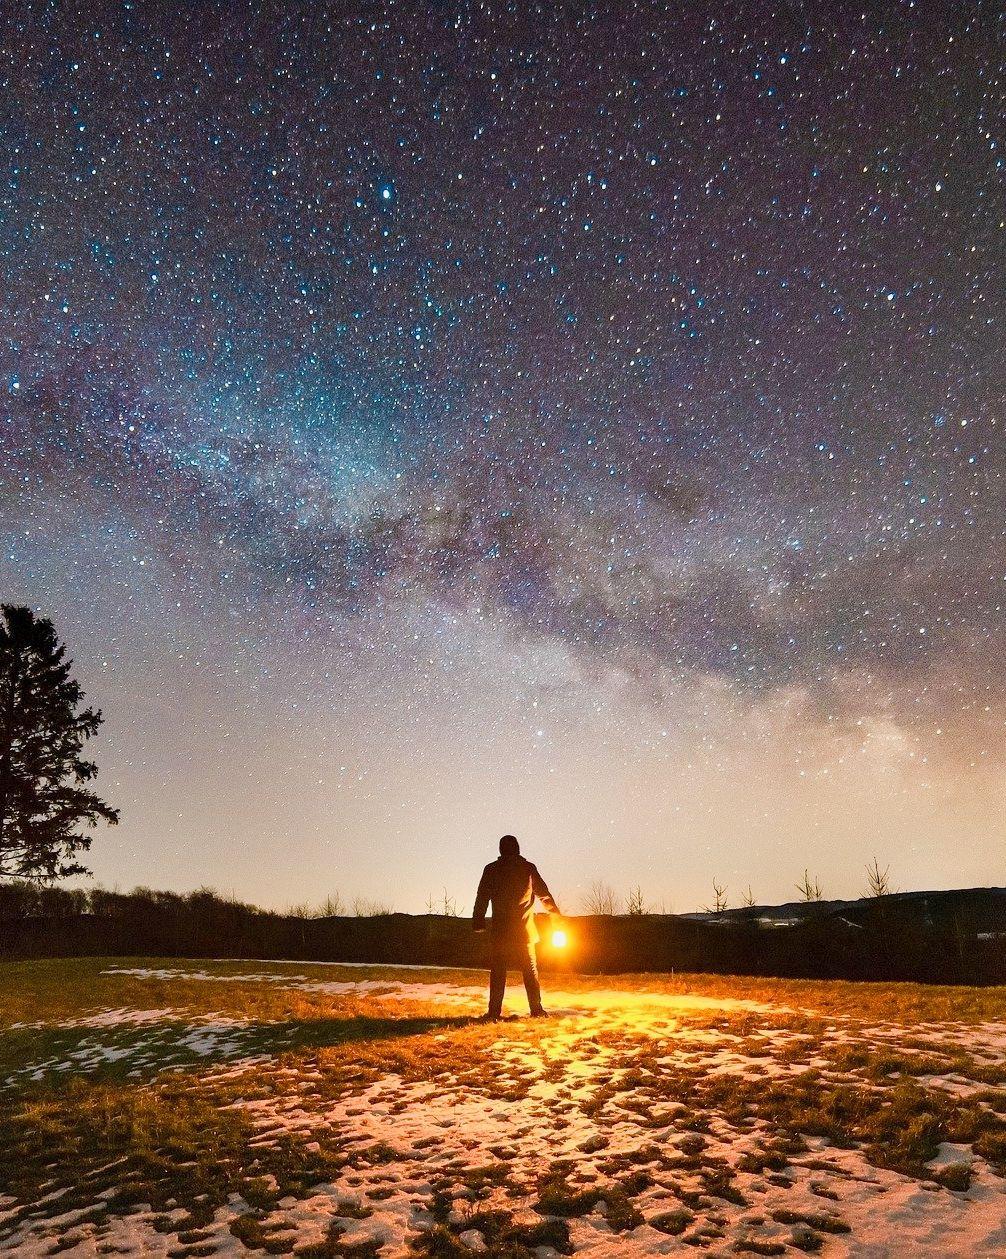 Galaxy Sky Wallpaper Sky Wallpaper Photo